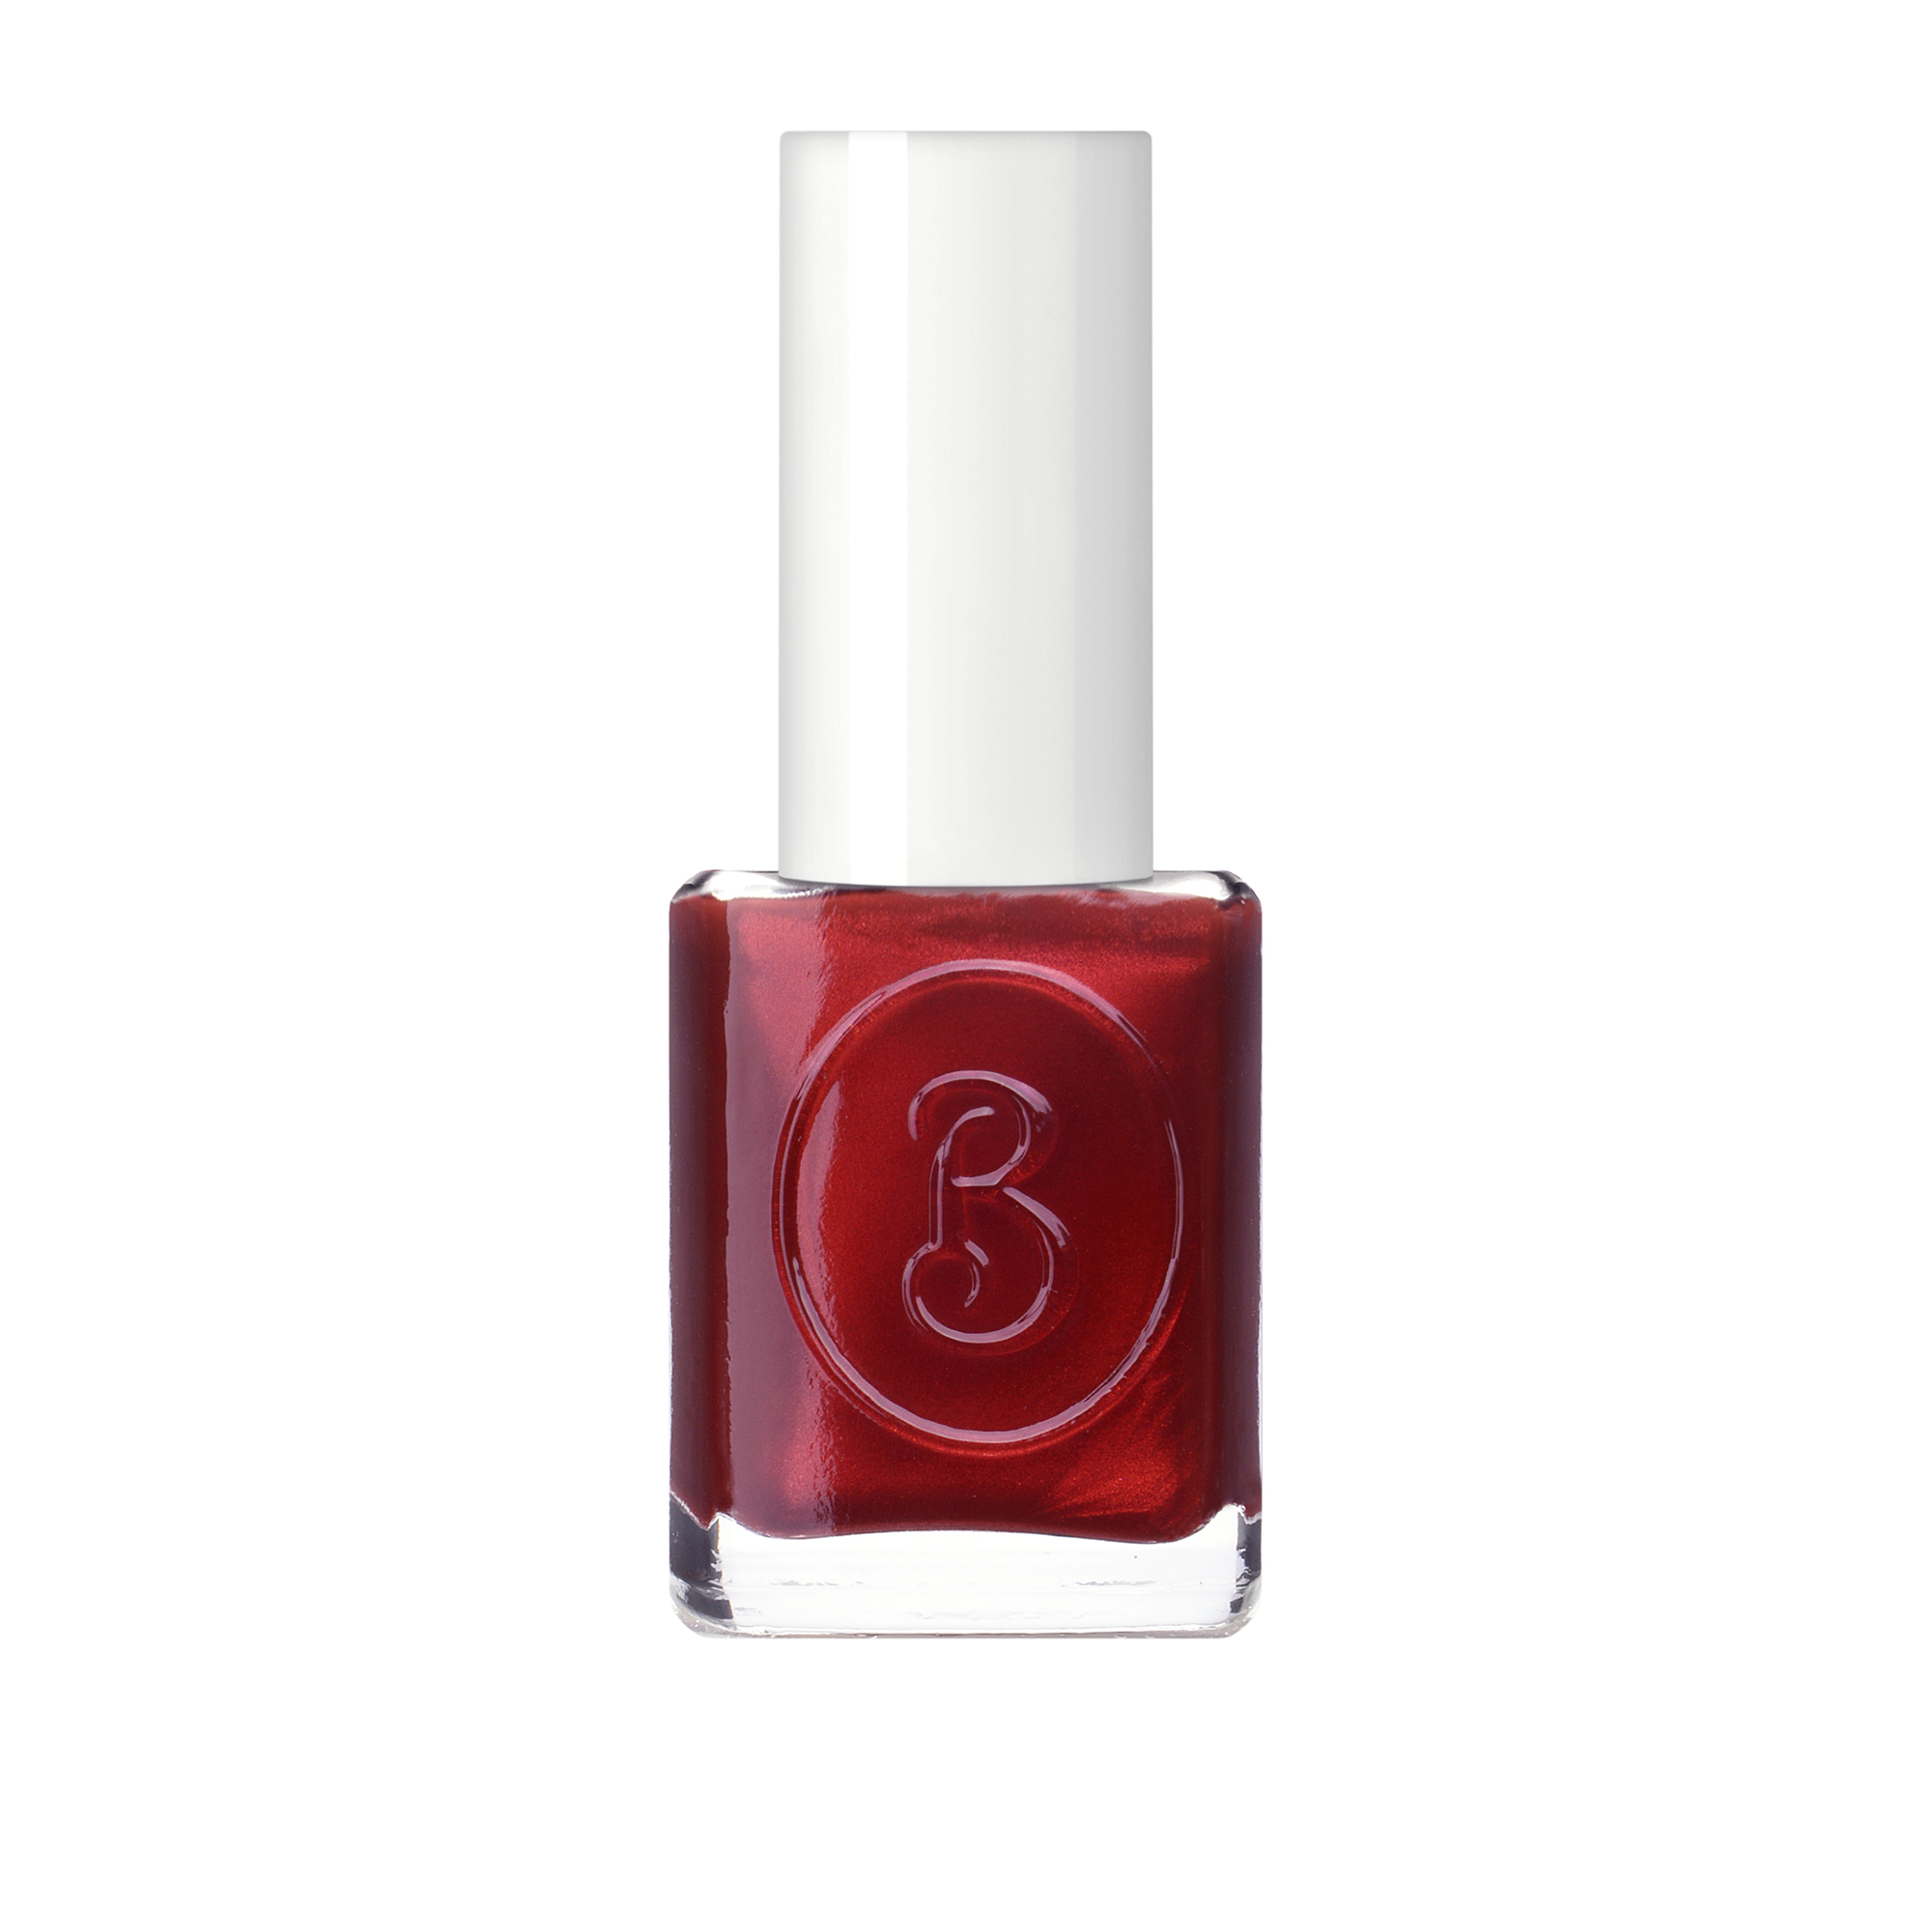 BERENICE 28 лак для ногтей, красный пожар / Red fire 16 мл berenice 53 лак для ногтей рыжая лиса red fox 16 мл